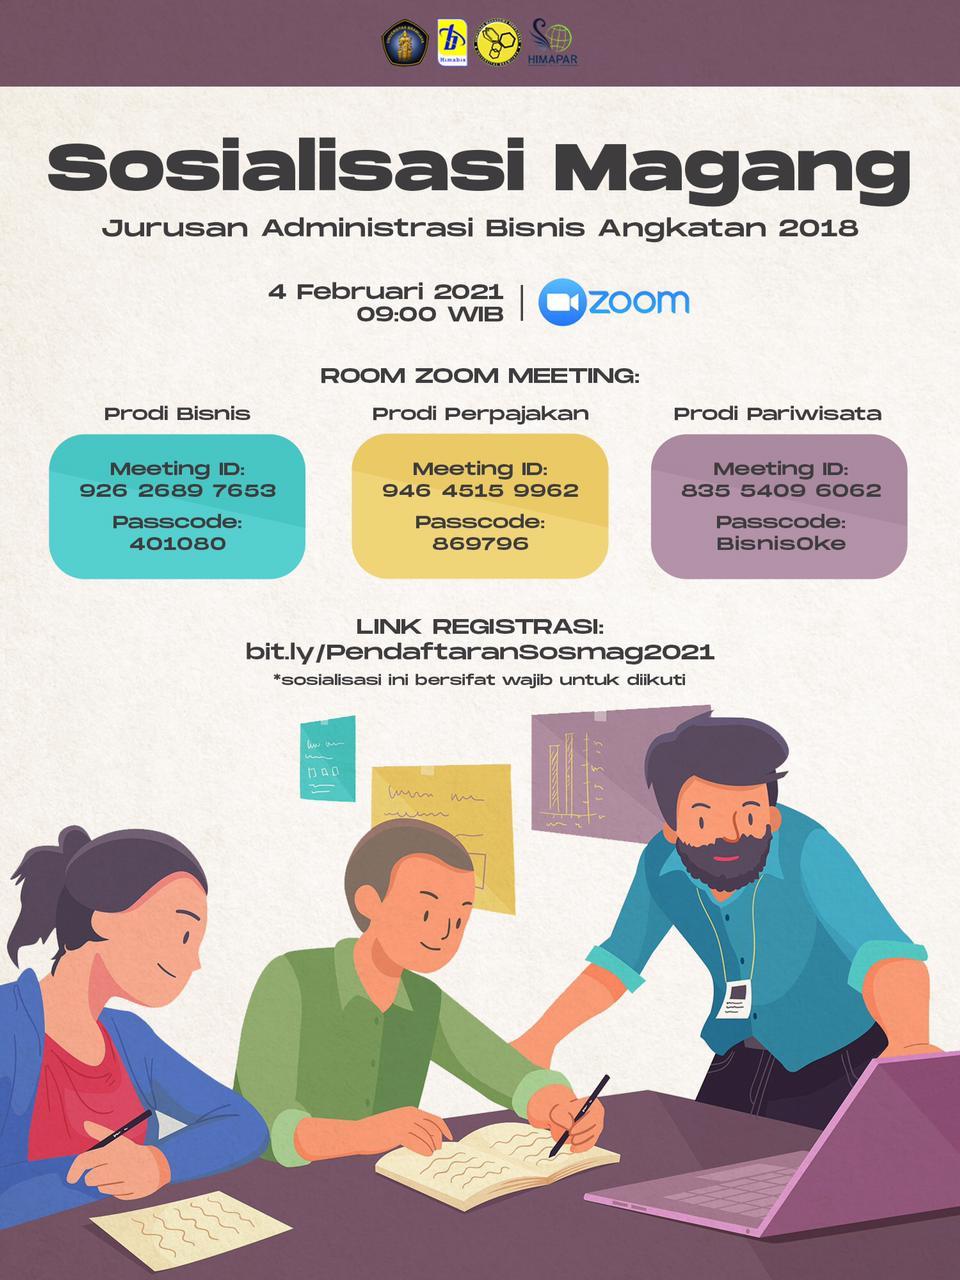 (Indonesia) SOSIALISASI MAGANG JURUSAN ADMINISTRASI BISNIS ANGKATAN 2018